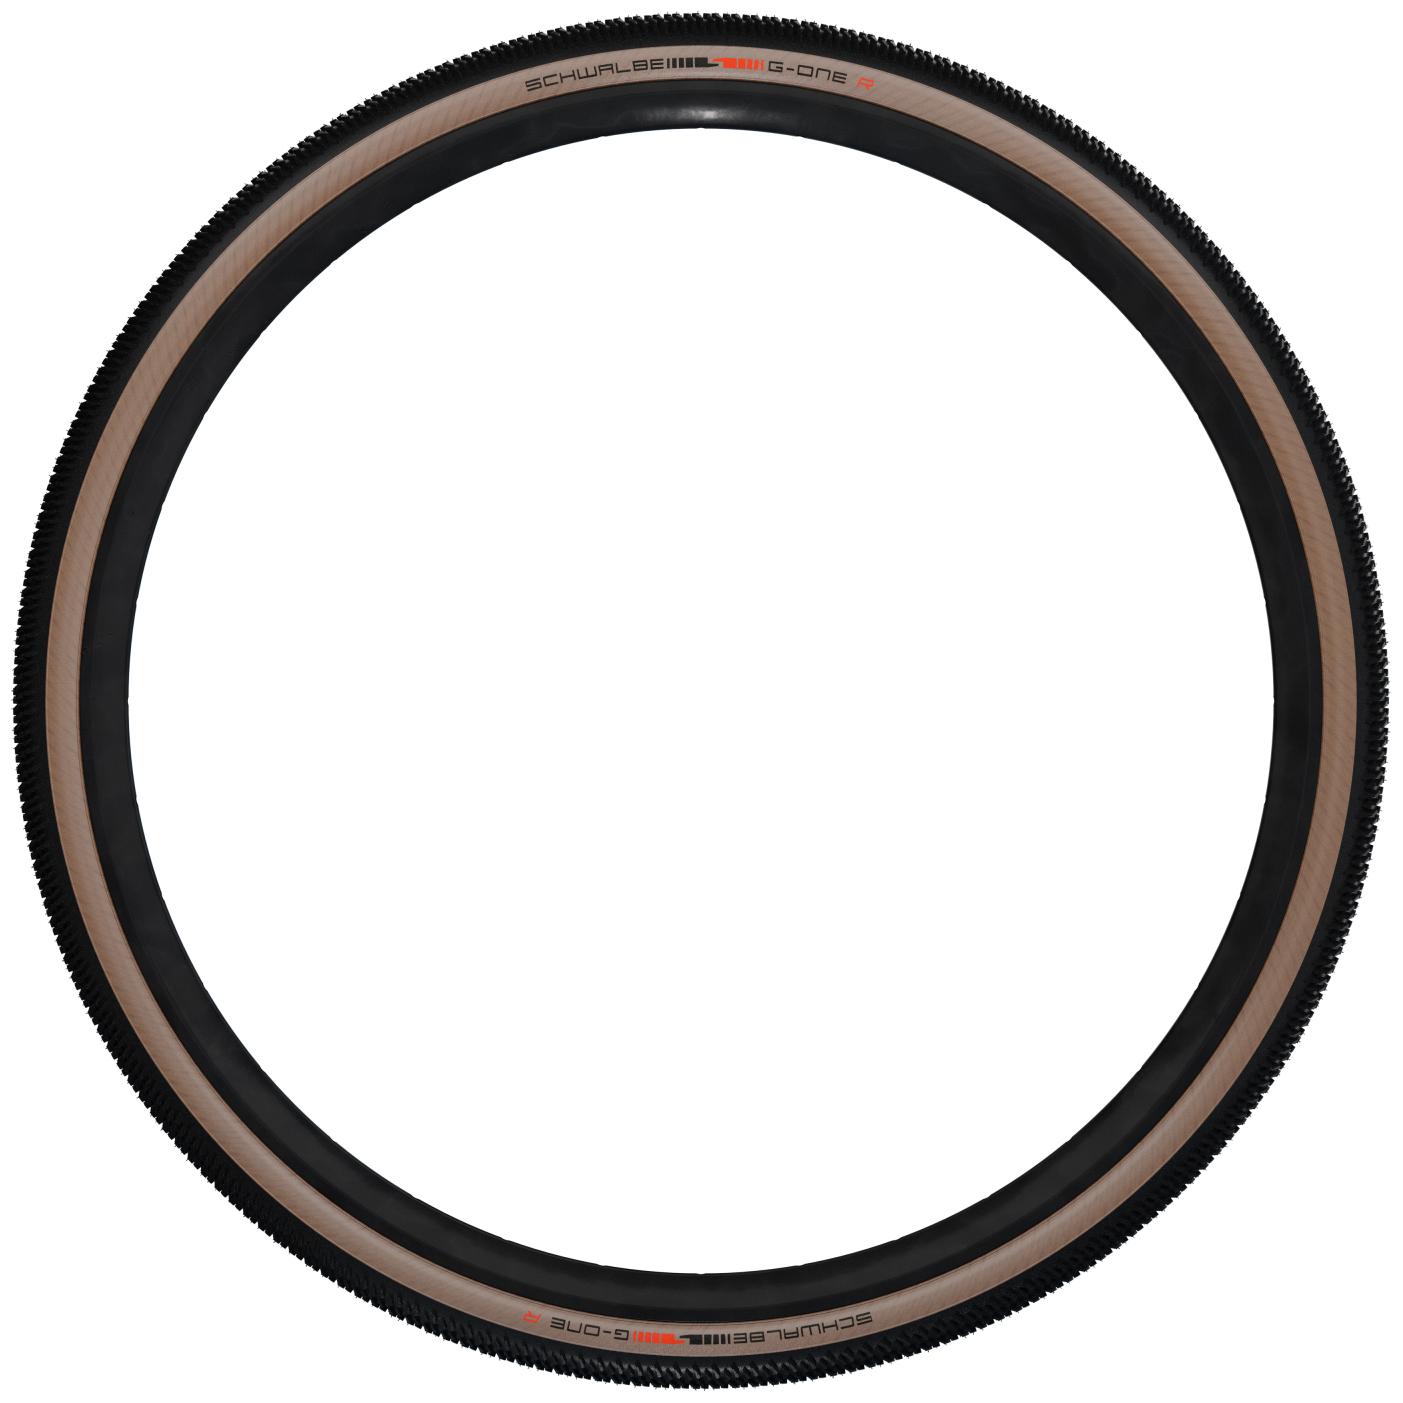 Image of Schwalbe G-One R TLE Folding Tire - Super Race - V-Guard - Addix Race - 45-622 - Transparent-Skin